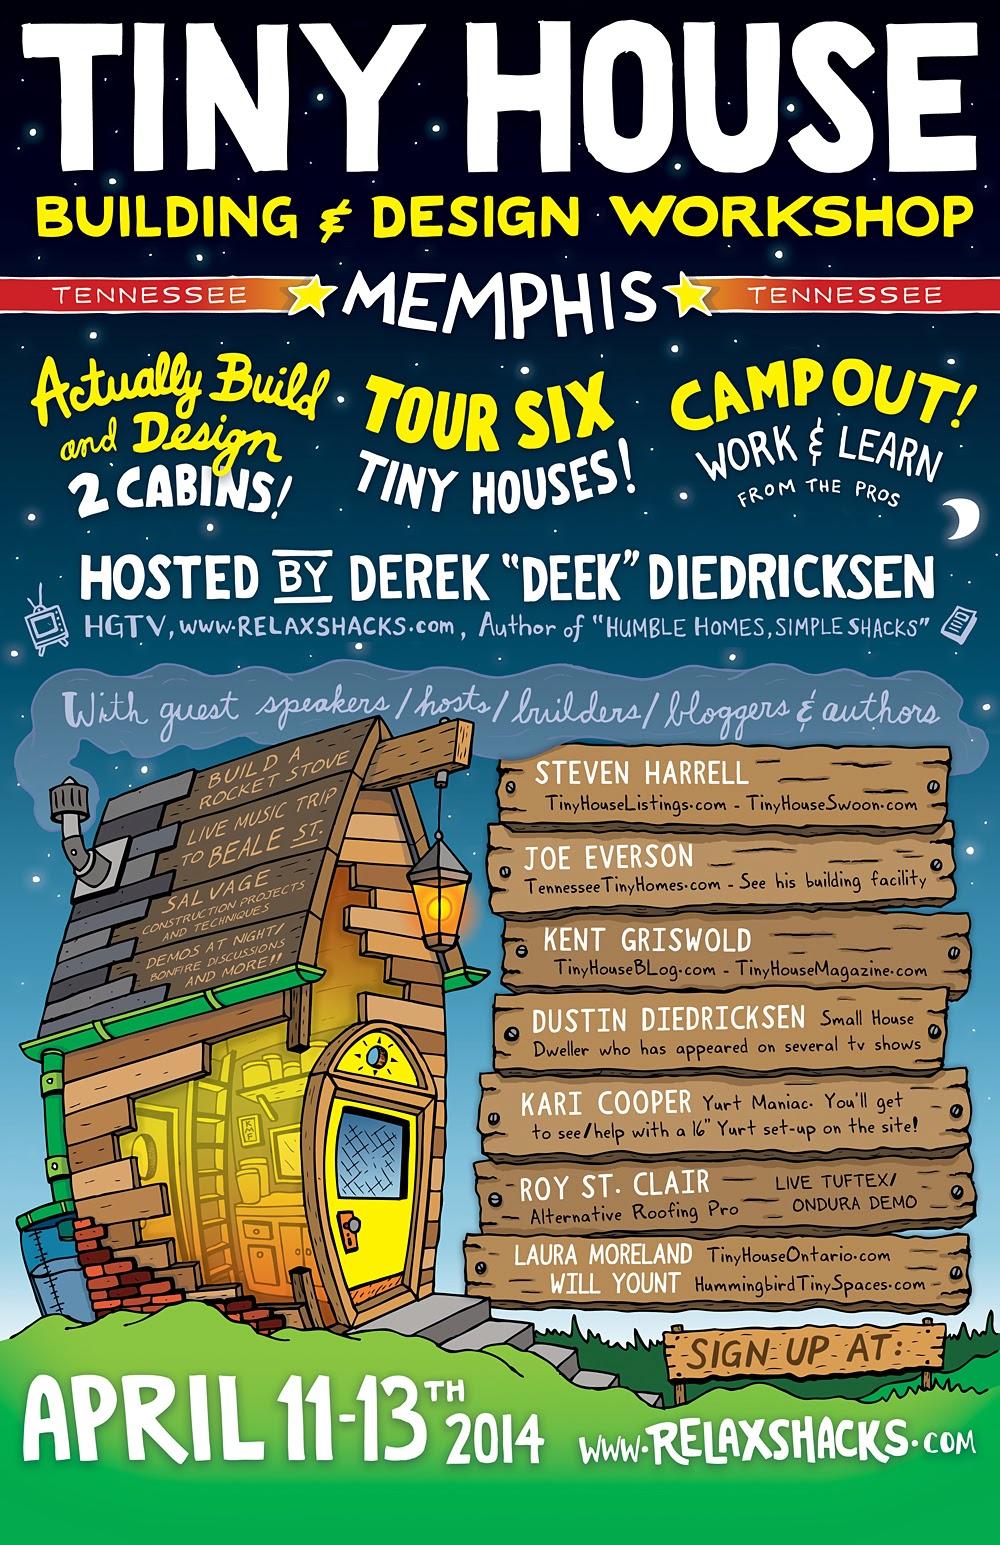 Relaxshacks com: MEMPHIS, Tennessee- SIX TINY HOUSES!